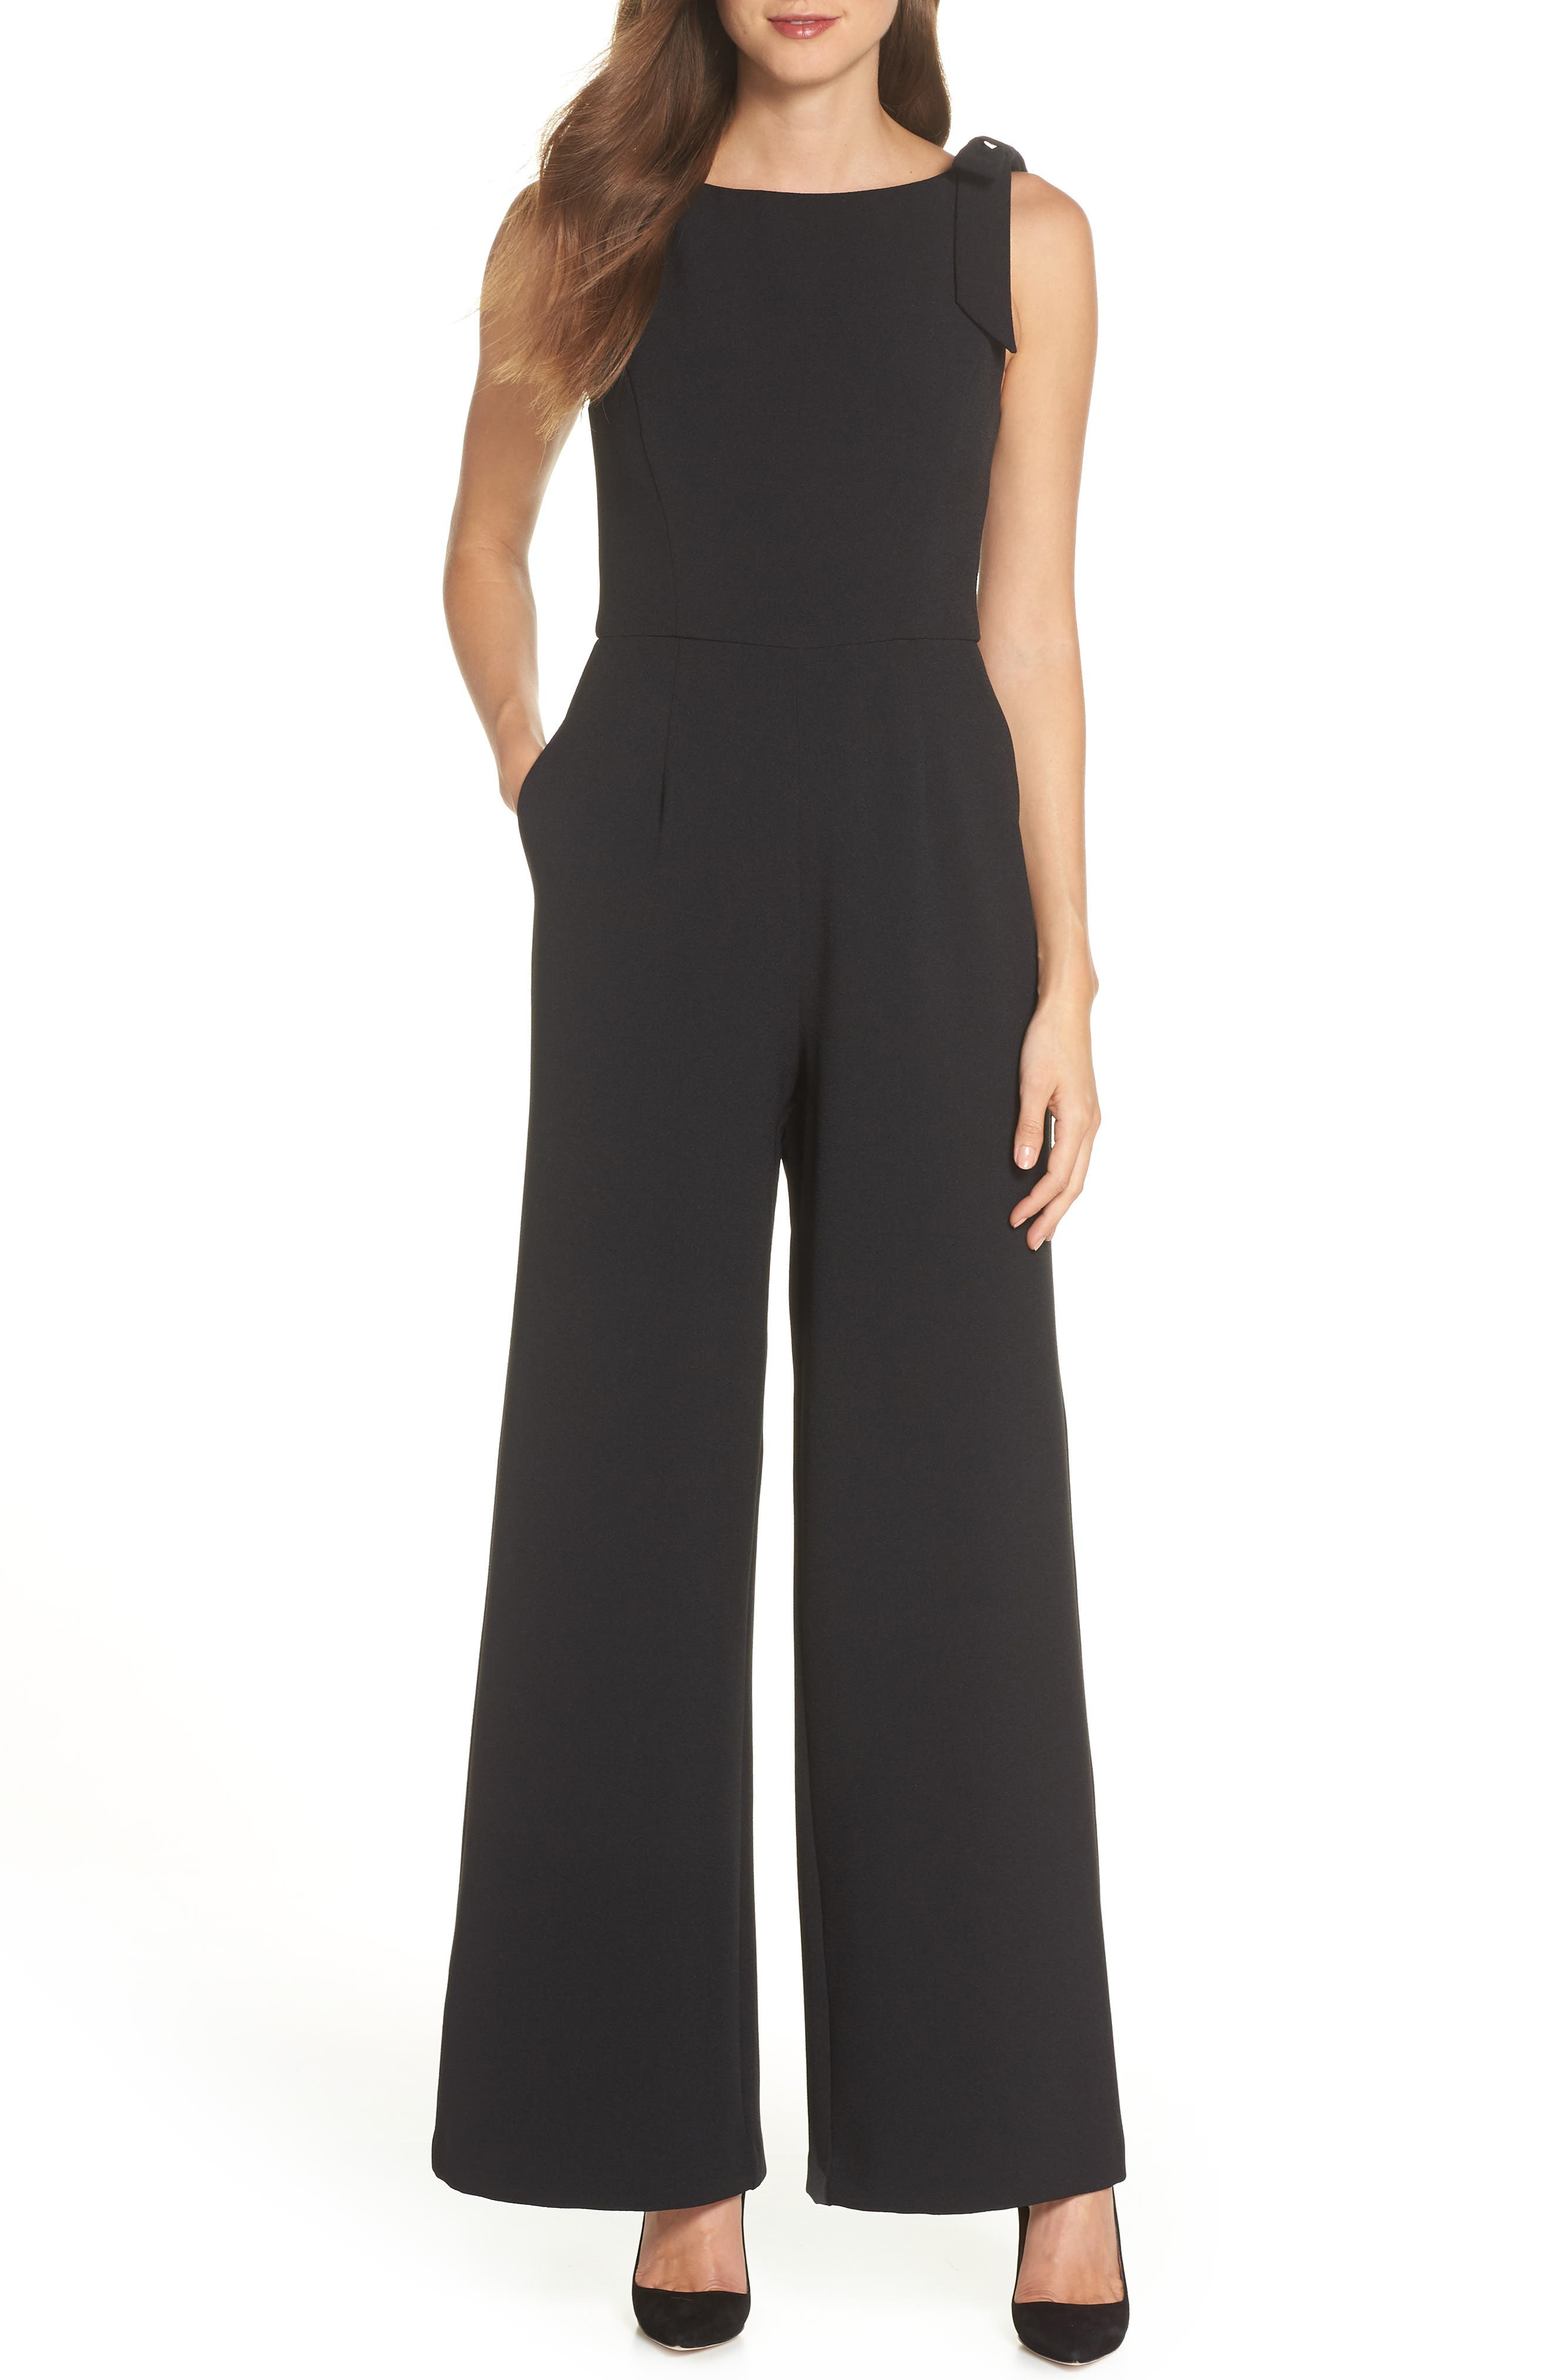 JULIA JORDAN Shoulder Bow Jumpsuit, Main, color, BLACK